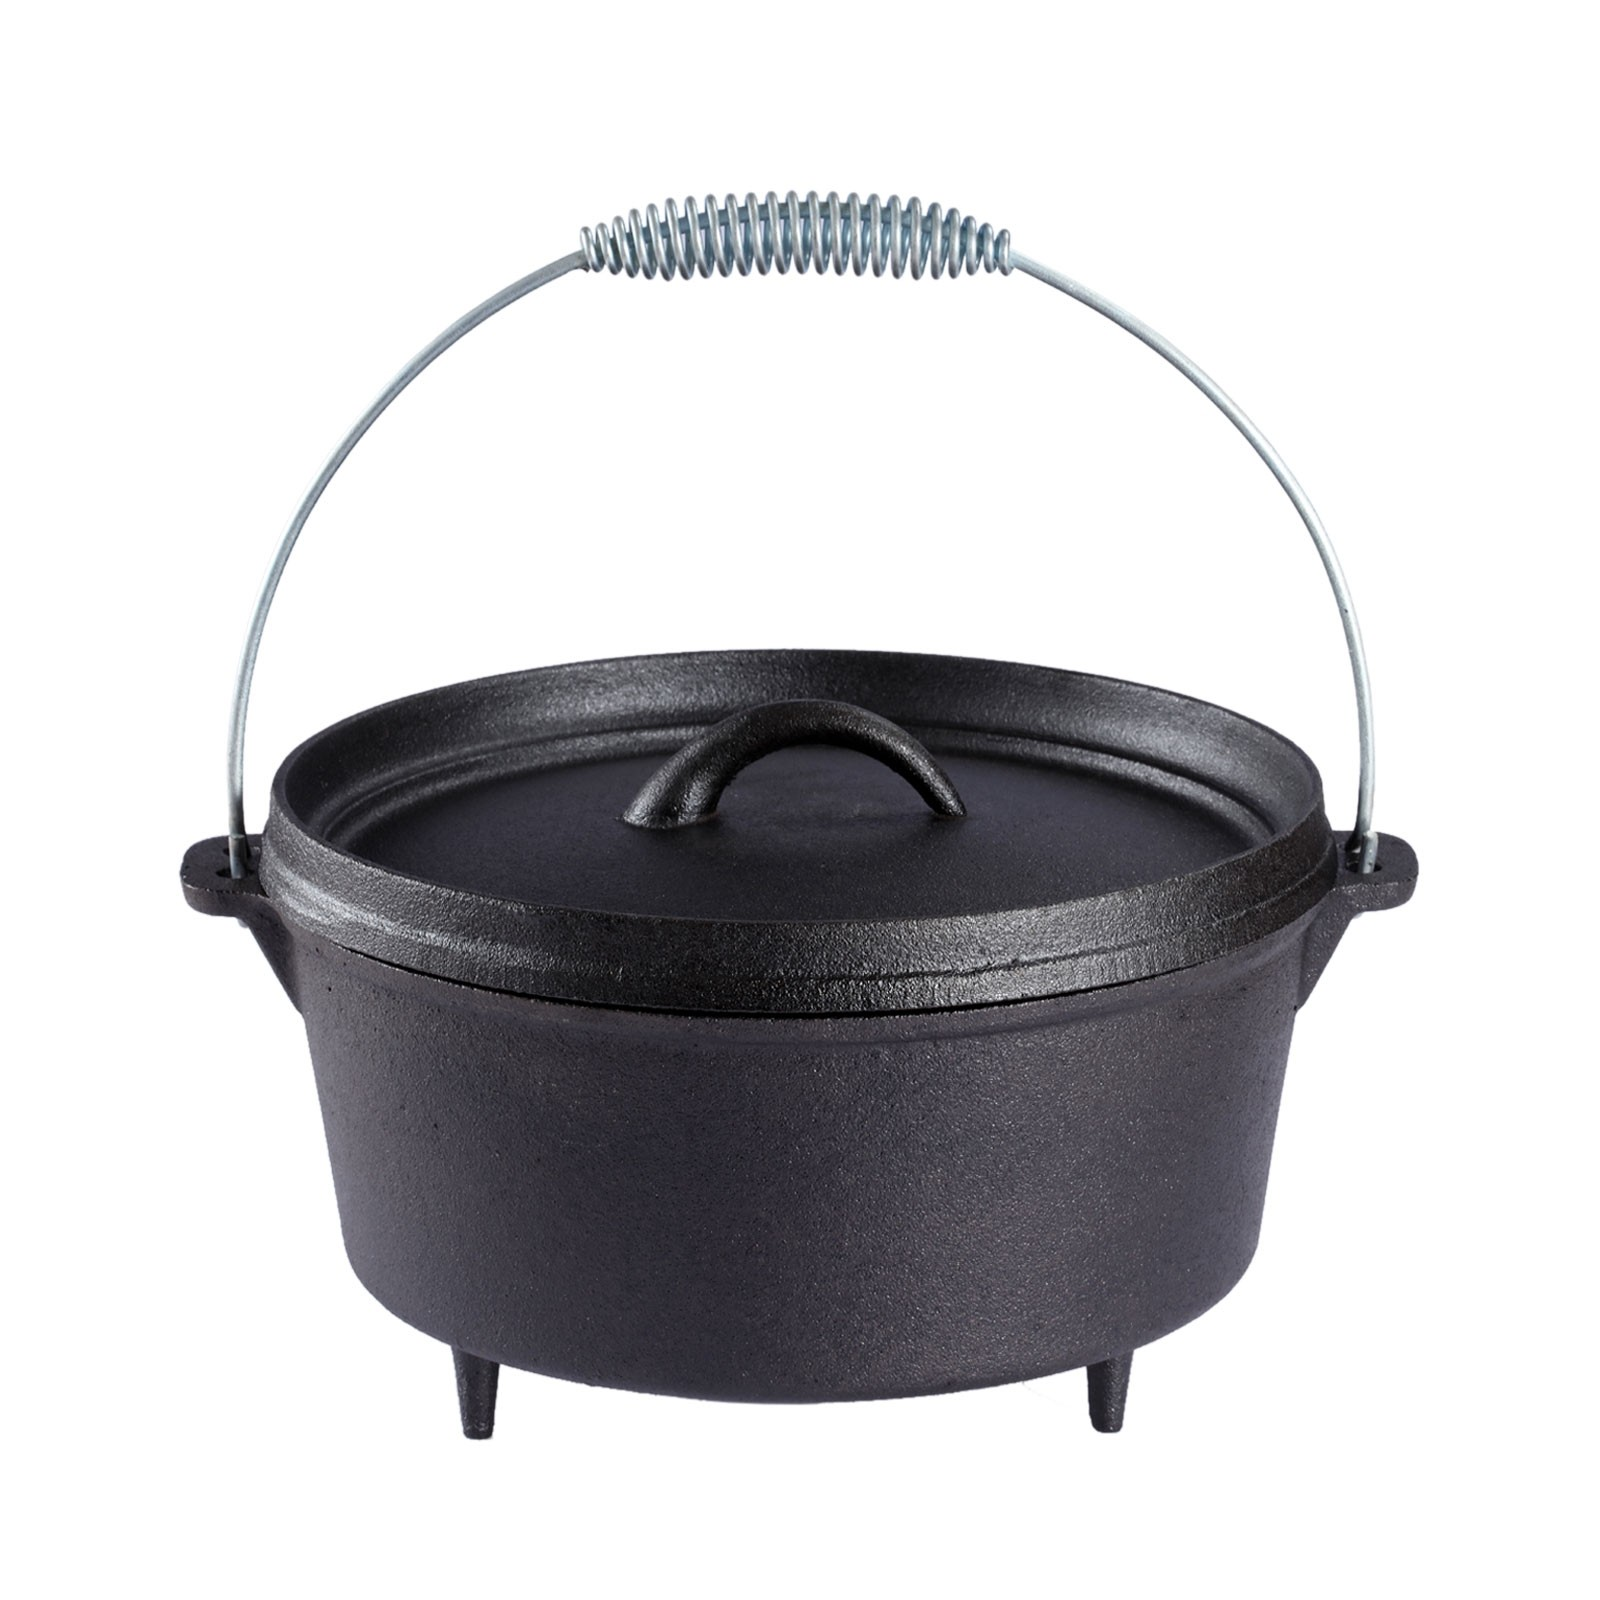 Dutch Oven 4.5 QUART Cast Iron Camp Pot Outdoor Camping